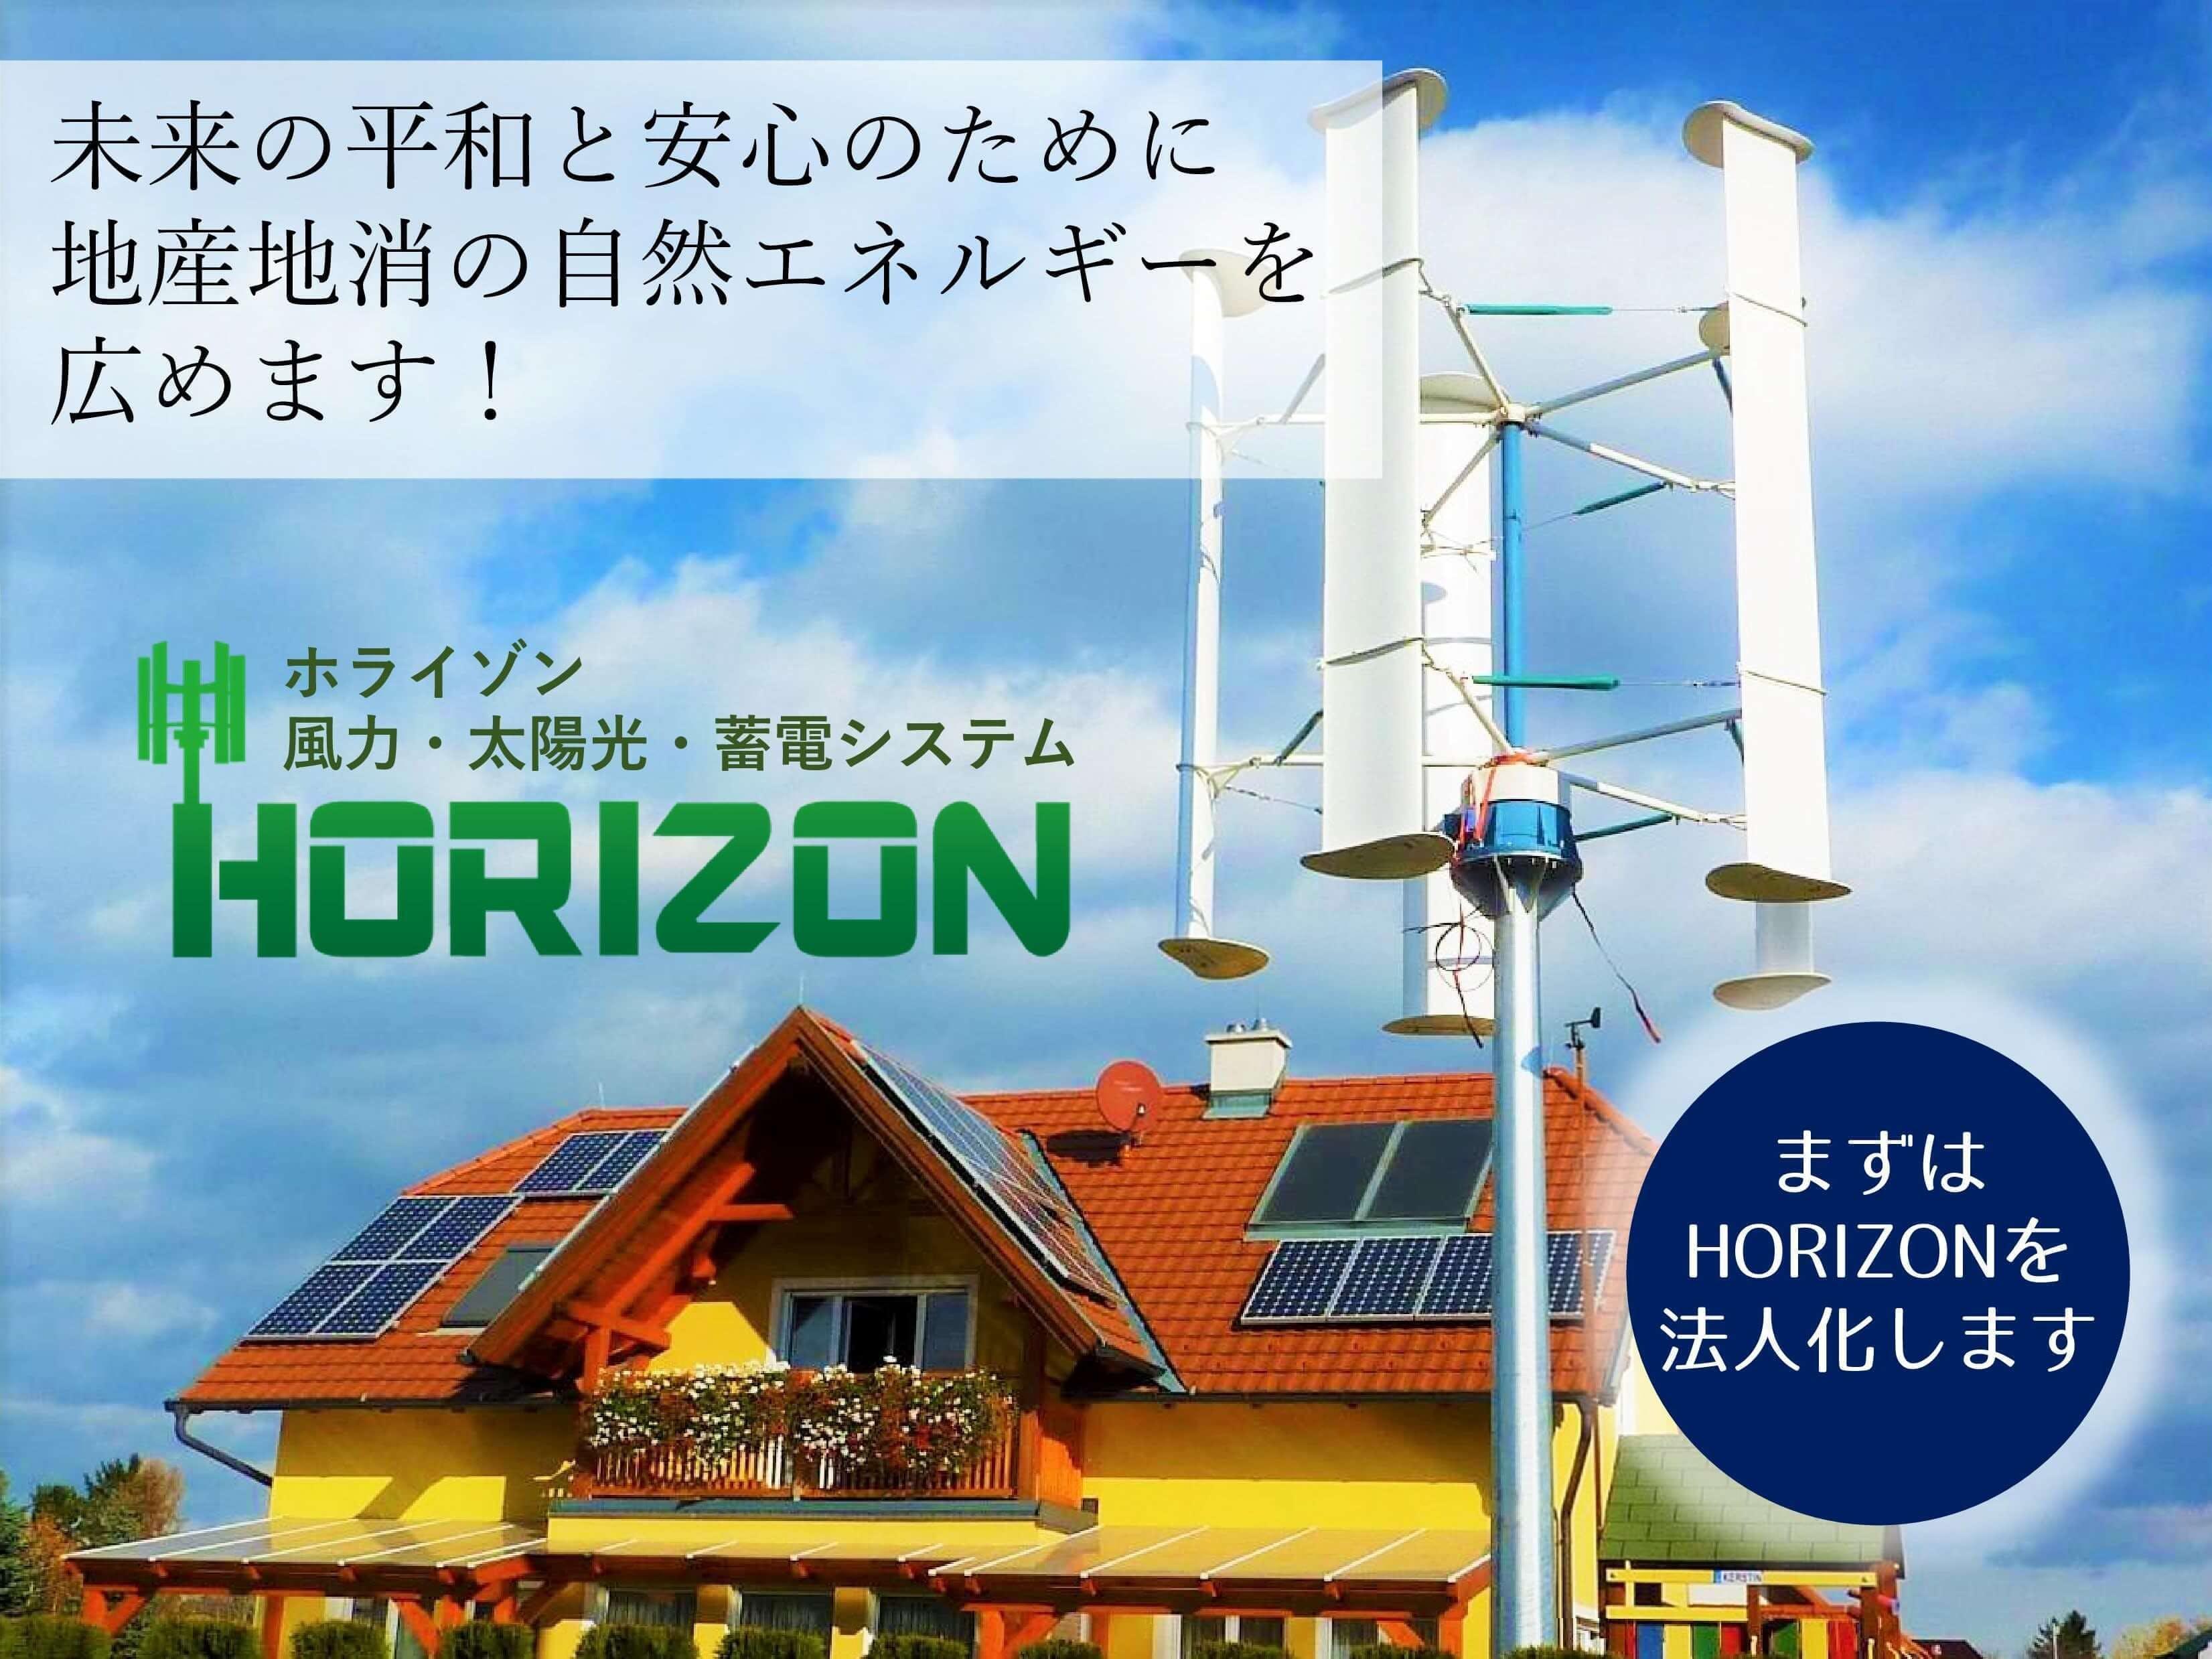 Horizon houjin .jpg?ixlib=rails 2.1